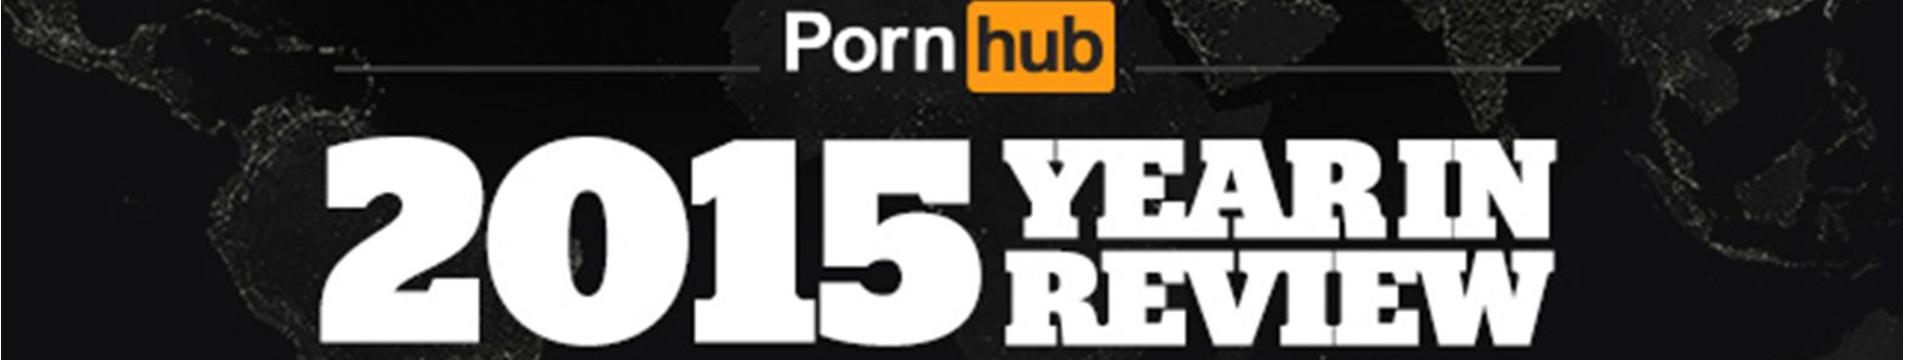 pornhub-2015-in-review-blog-header.jpg